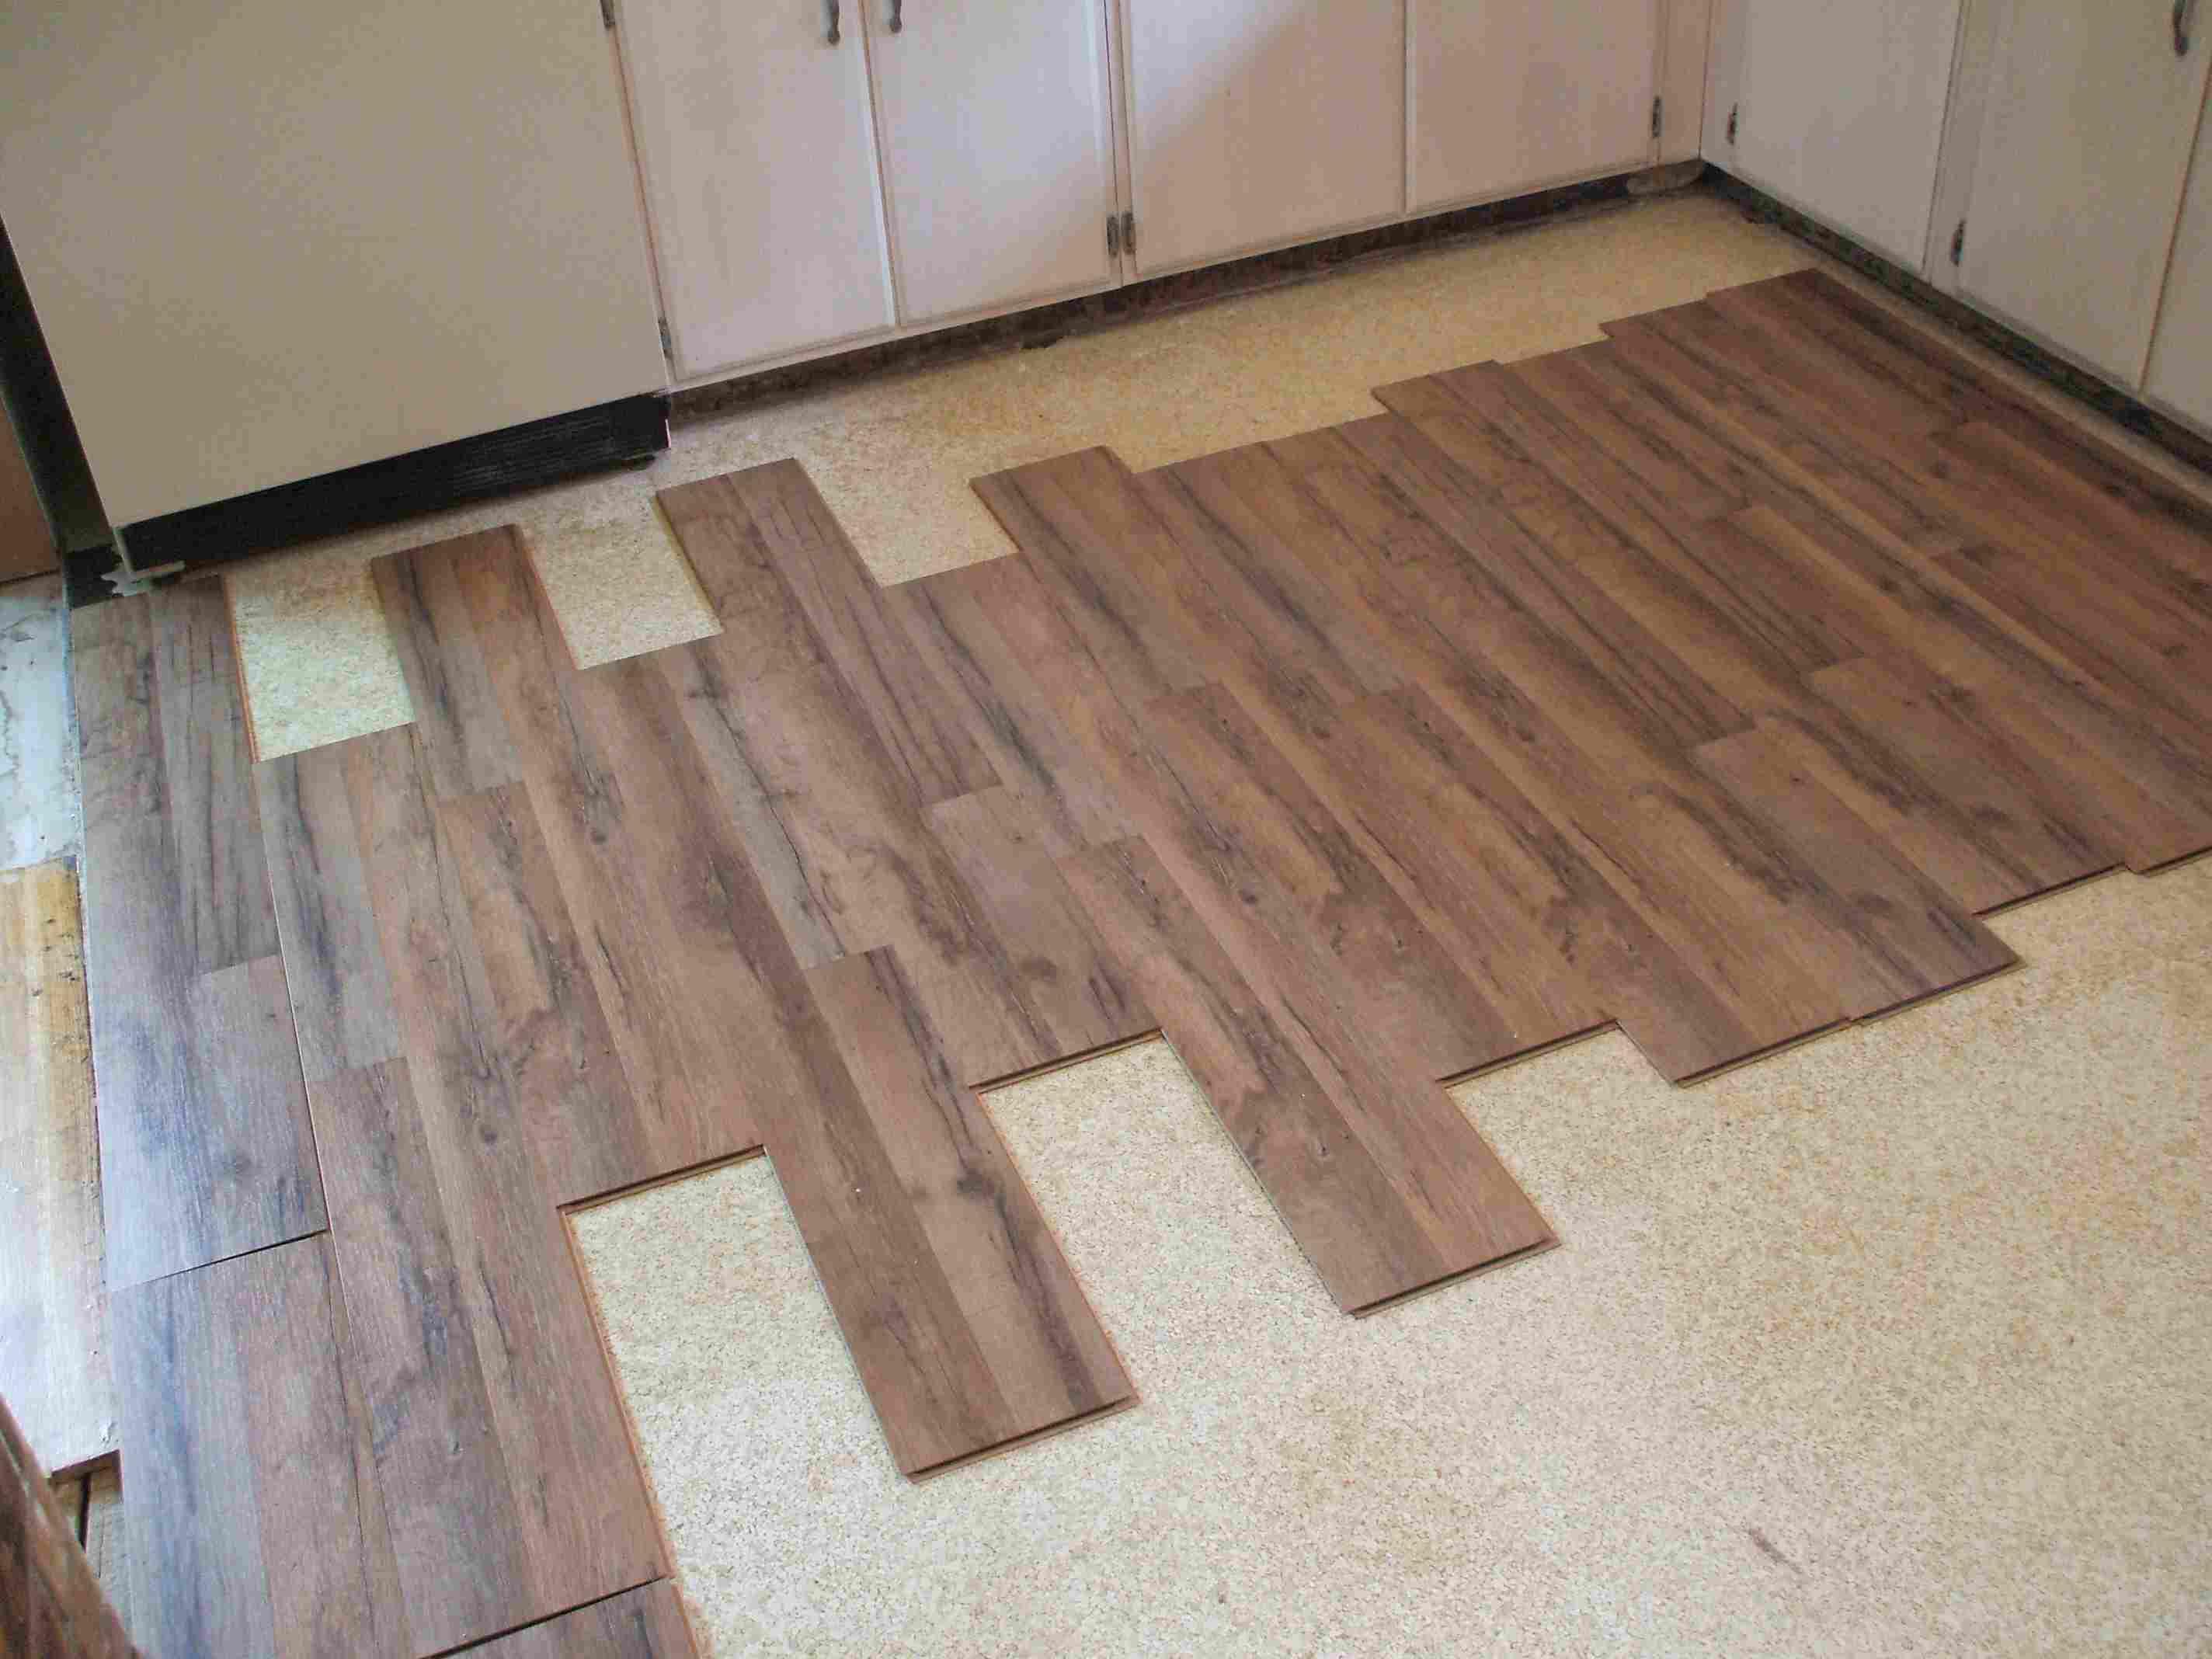 hardwood flooring tips and tricks of laminate flooring installation made easy intended for installing laminate eyeballing layout 56a49d075f9b58b7d0d7d693 jpg